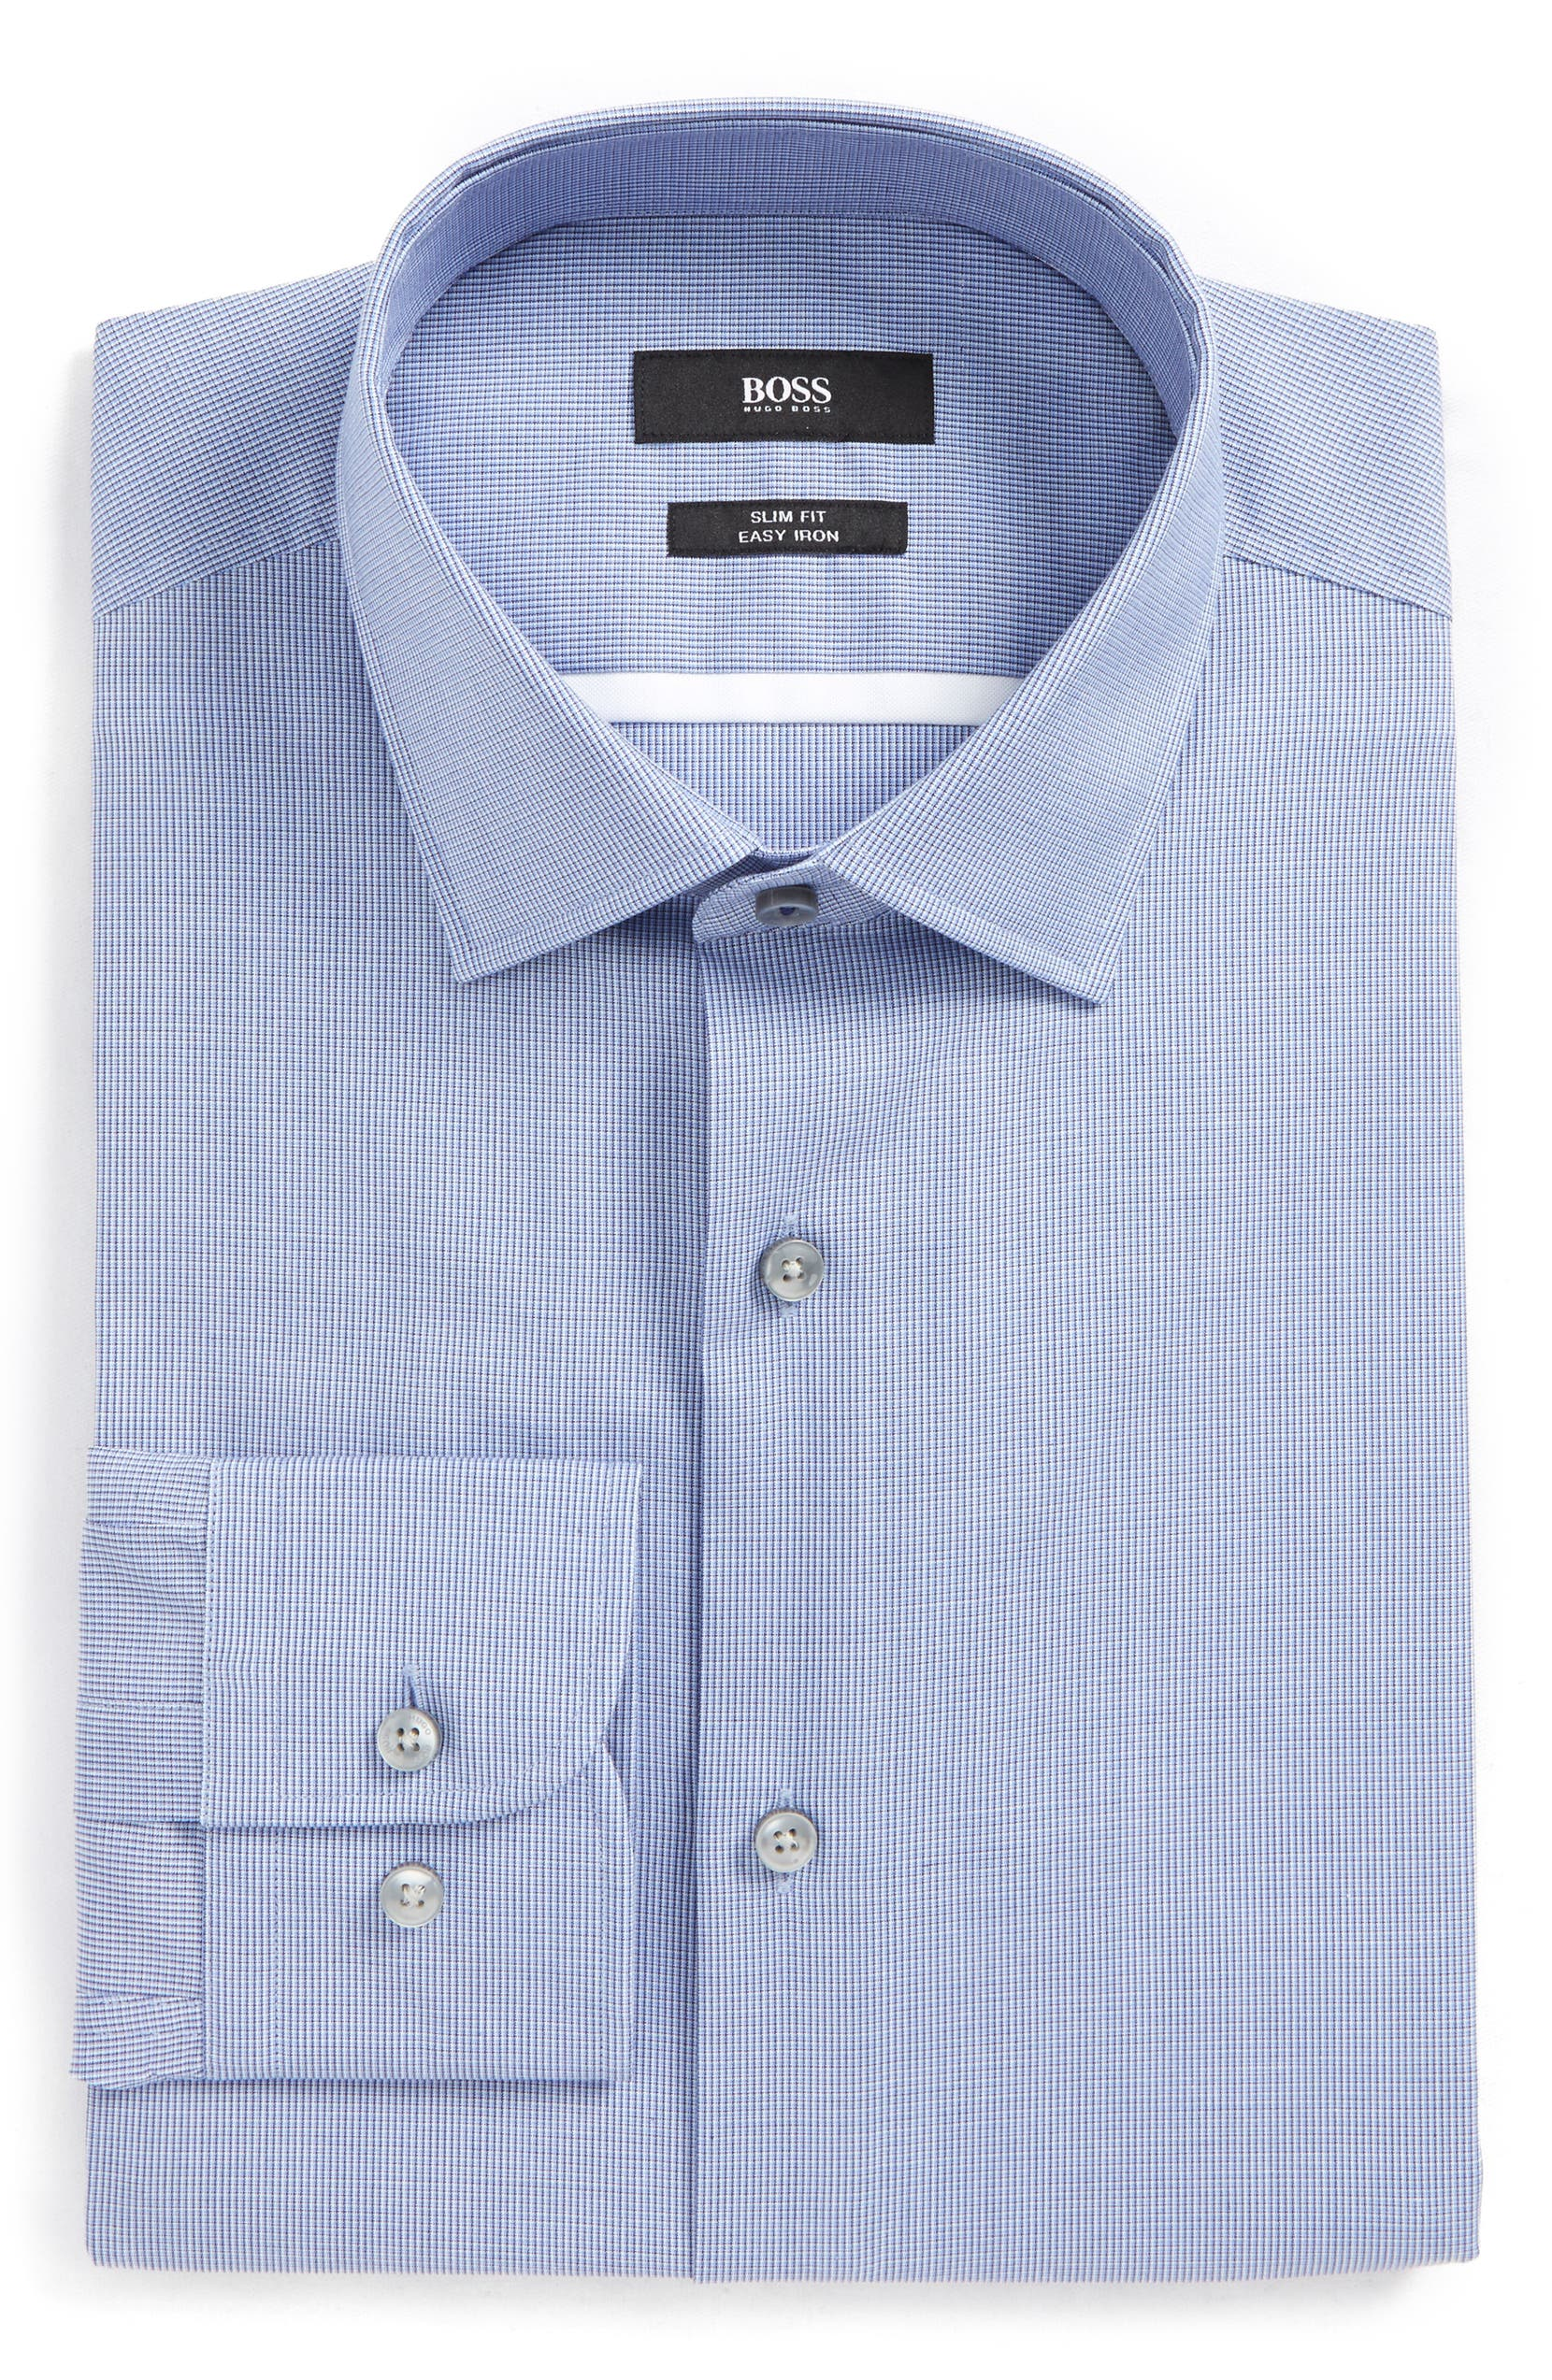 955c9002d BOSS Jerris Slim Fit Easy Iron Check Dress Shirt | Nordstrom